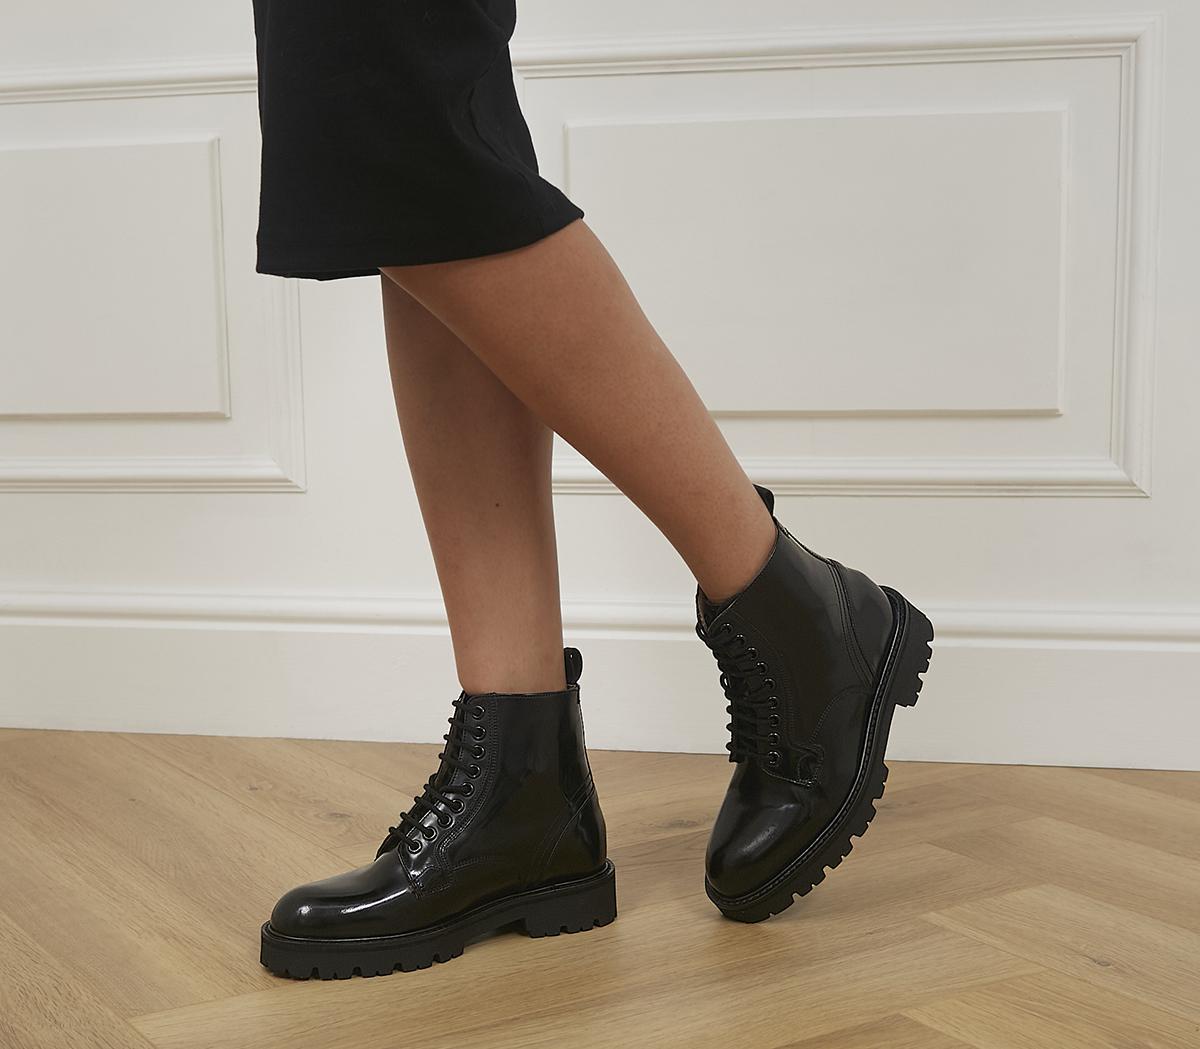 Mascy Lace Up Boots